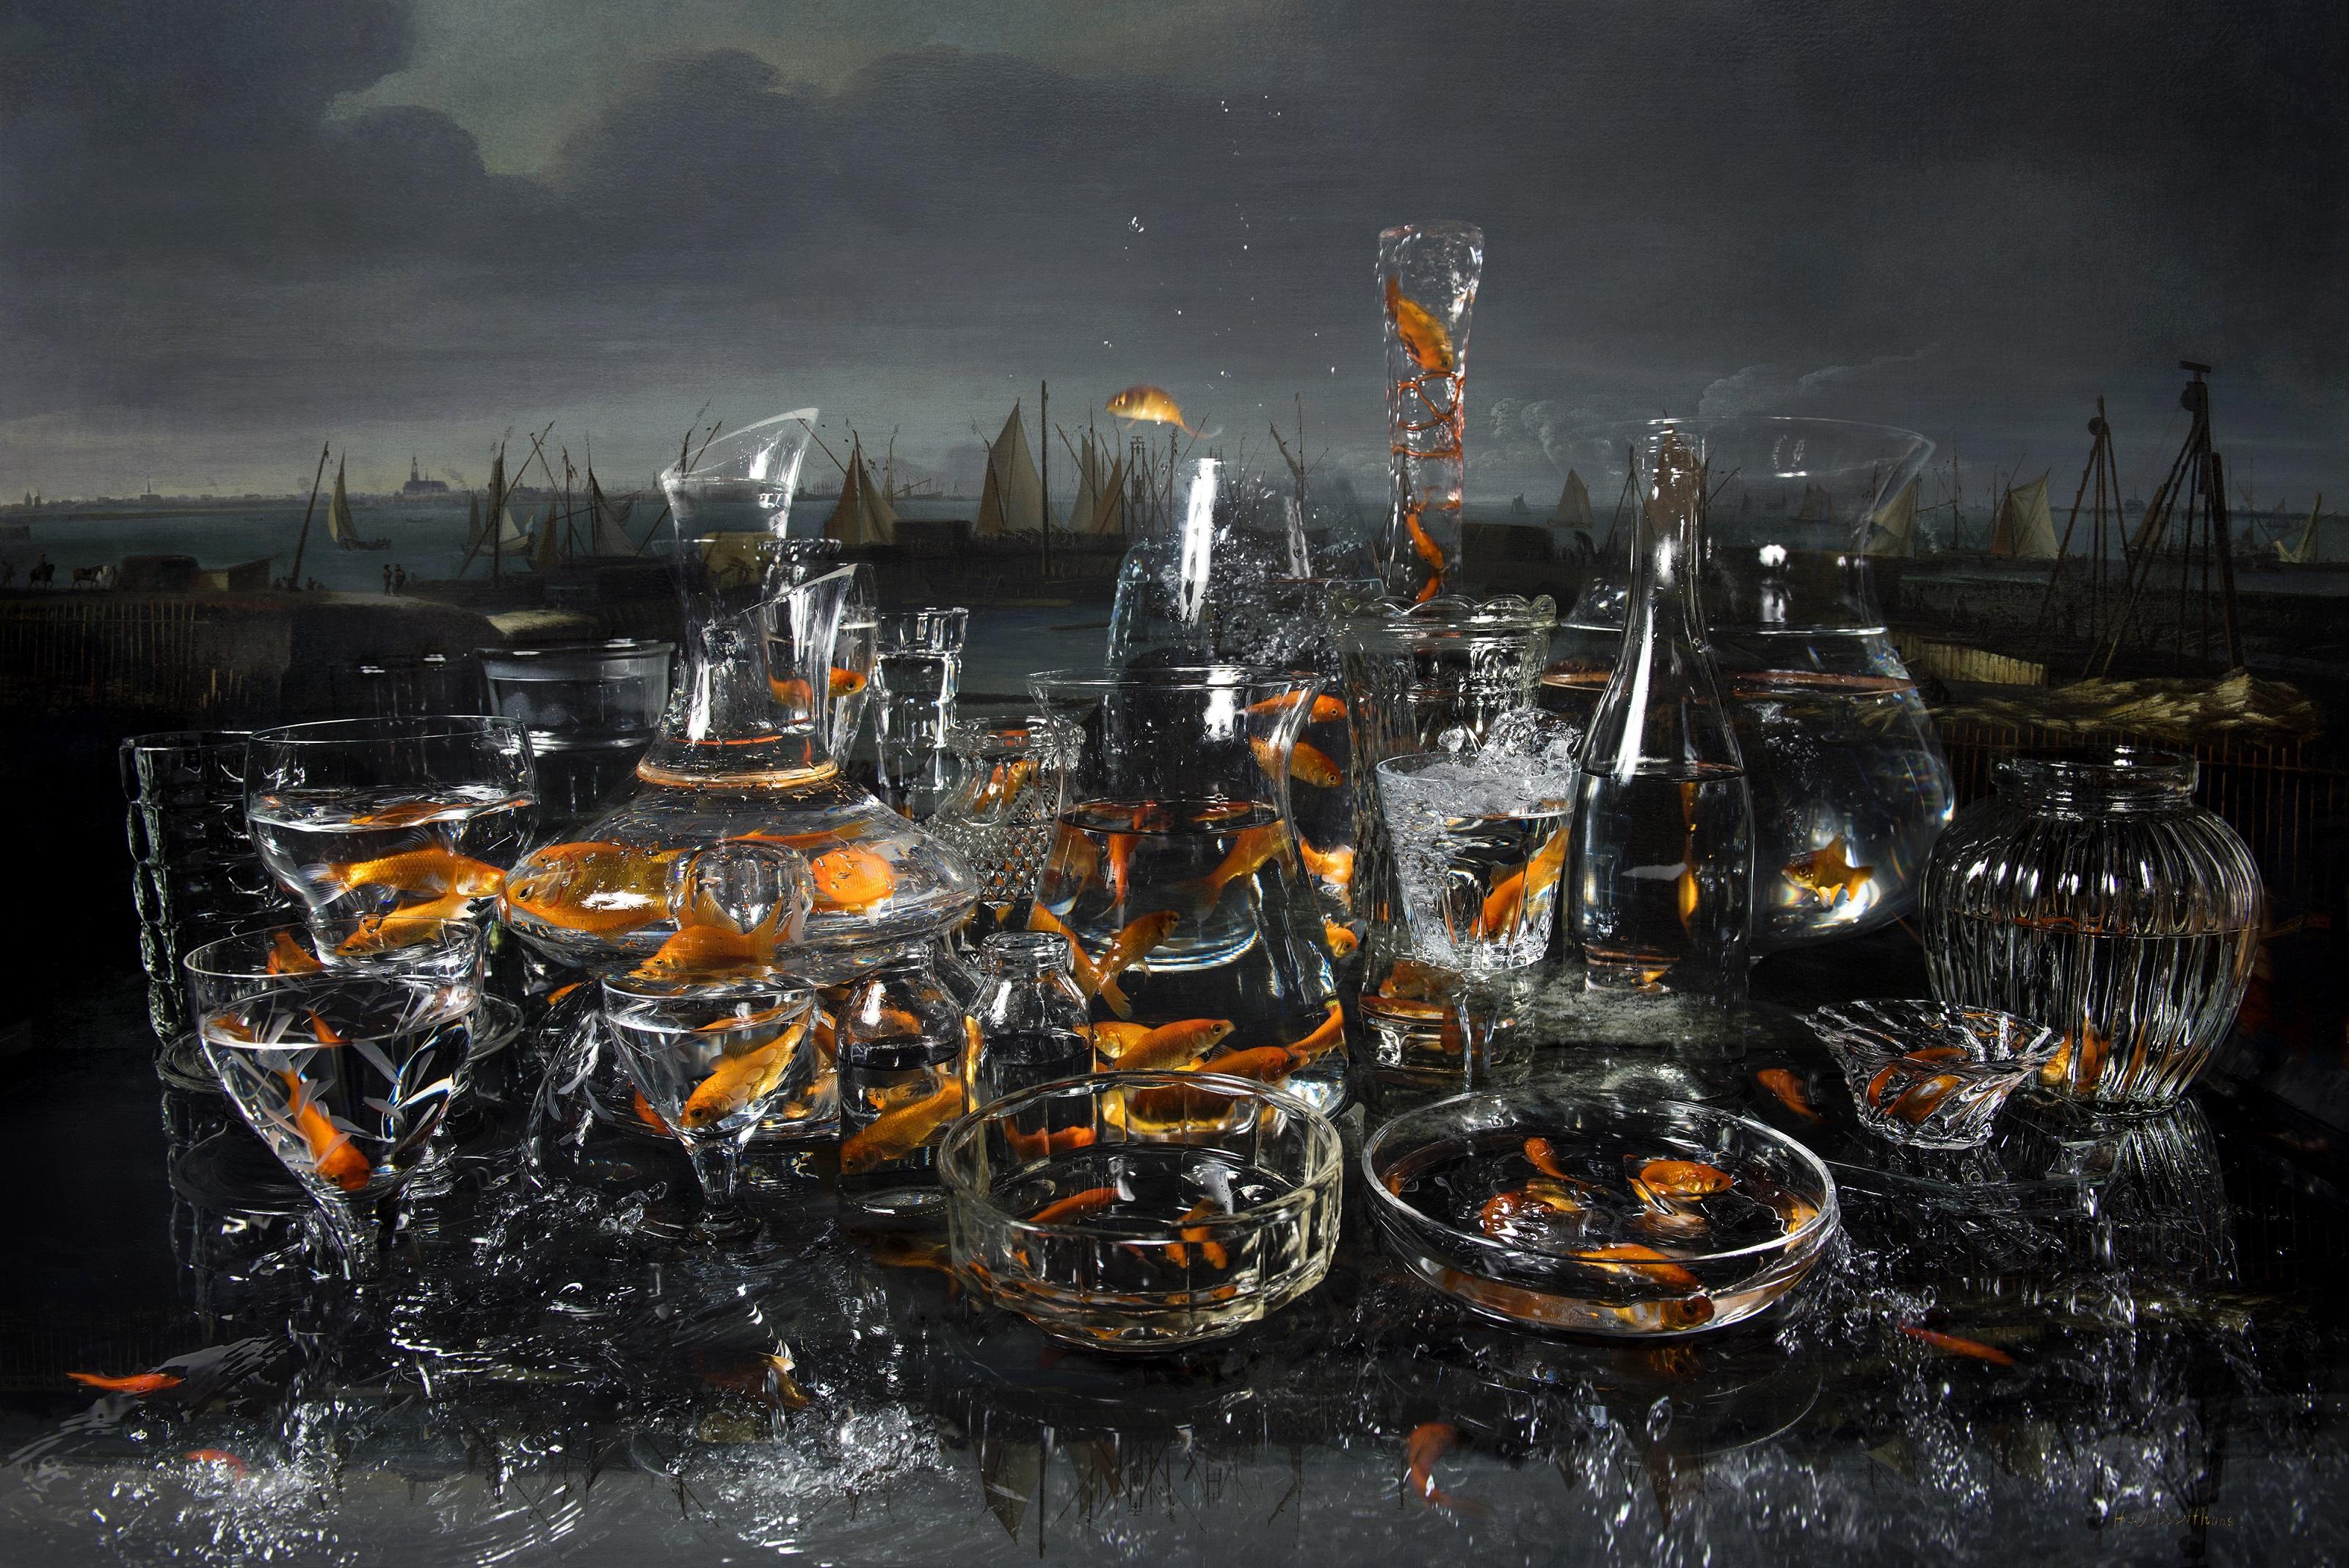 Fotokunstenaar Withoos overbrugt 350 jaar in Hoorn